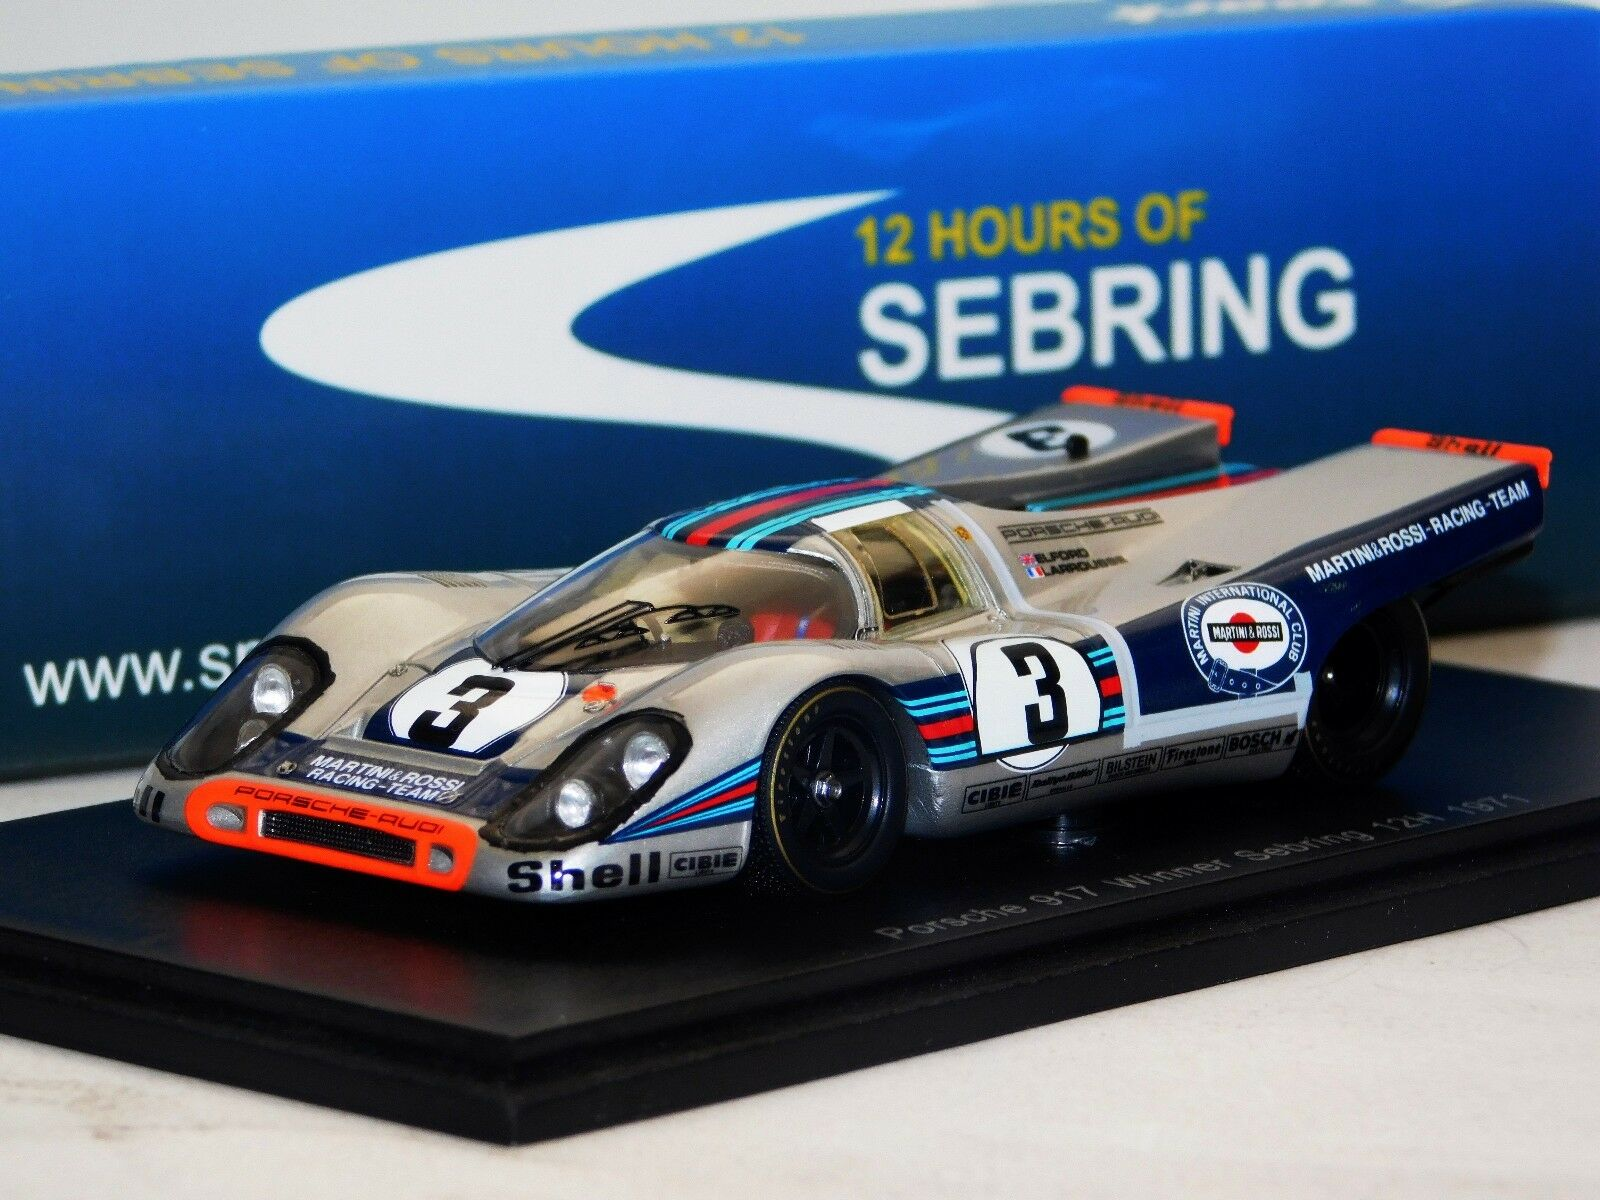 Porsche 917  3 ELFORD LARROUSSE Ganador Sebring 1971 Spark 43SE71 1 43